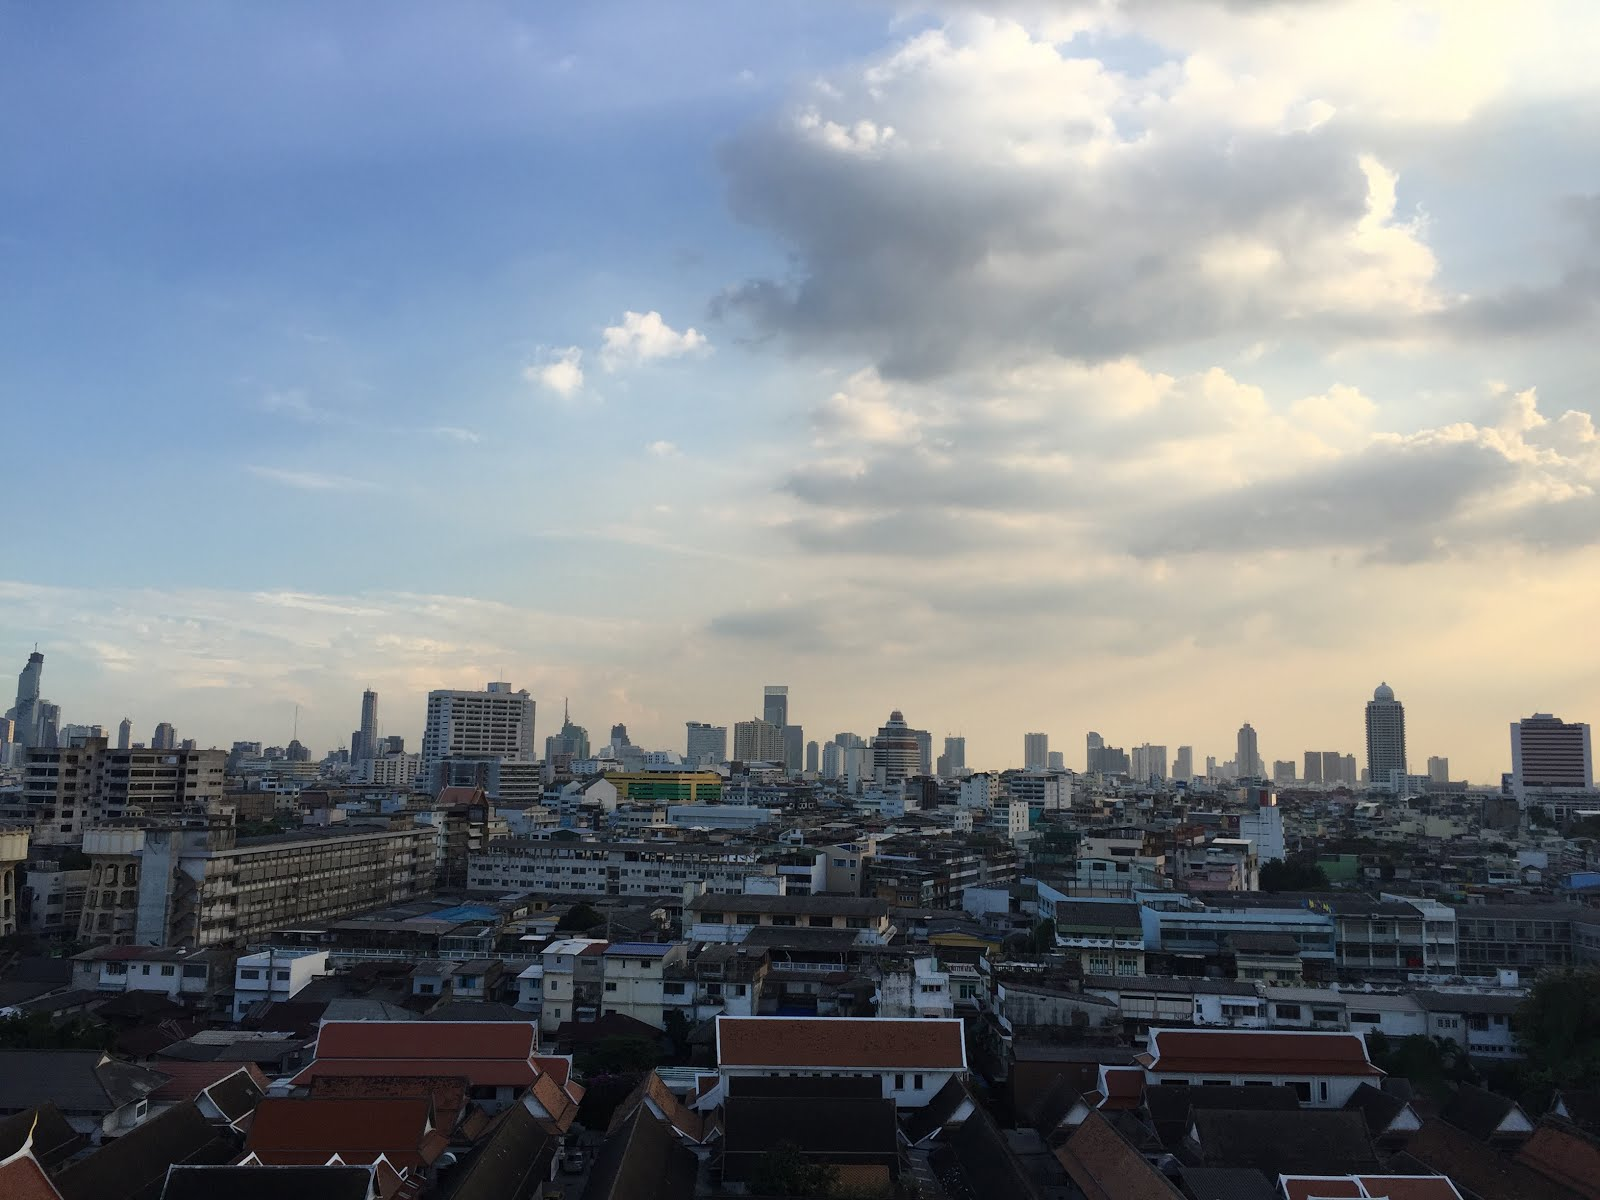 Downtown View of Bangkok, Thailand